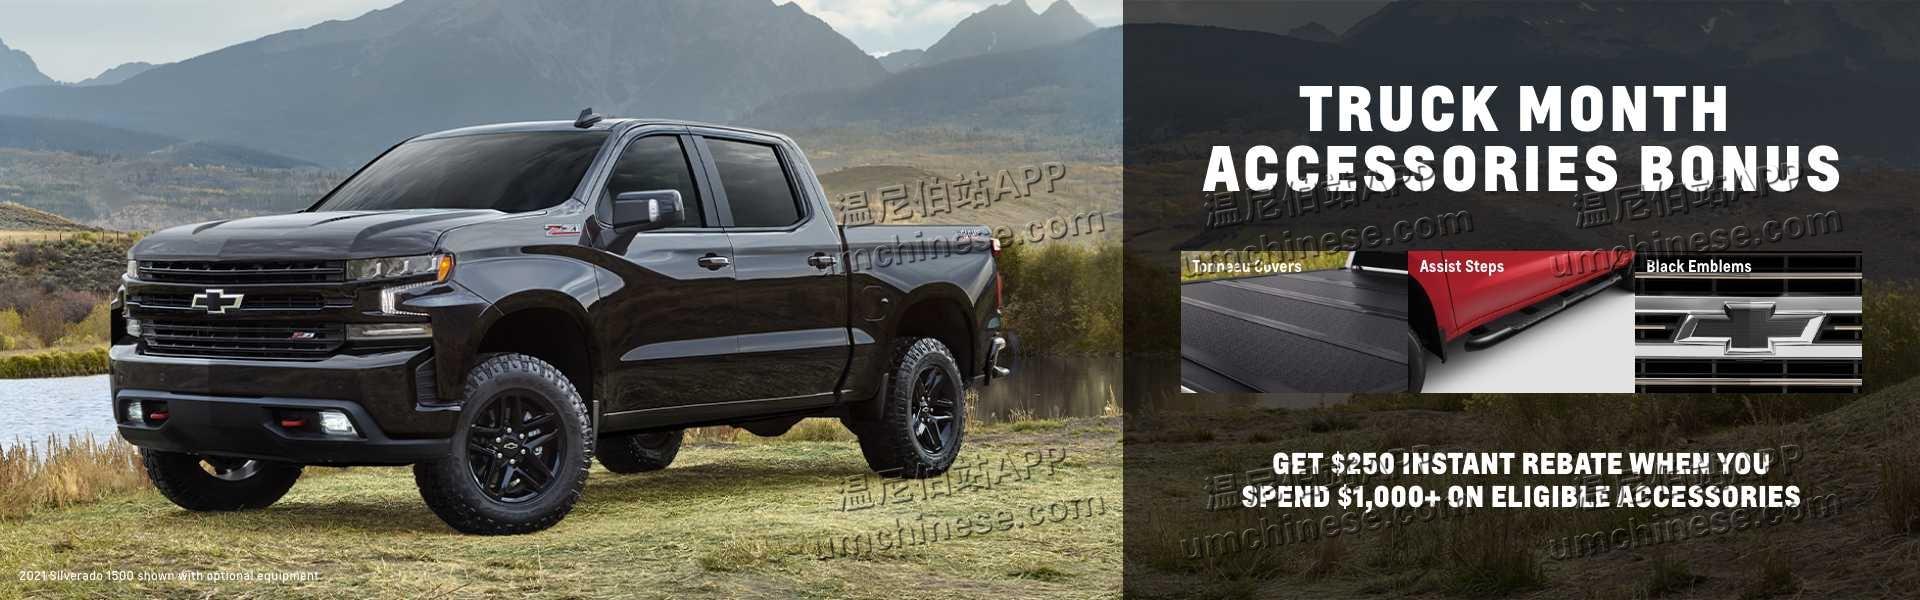 2021 truck month2.jpg